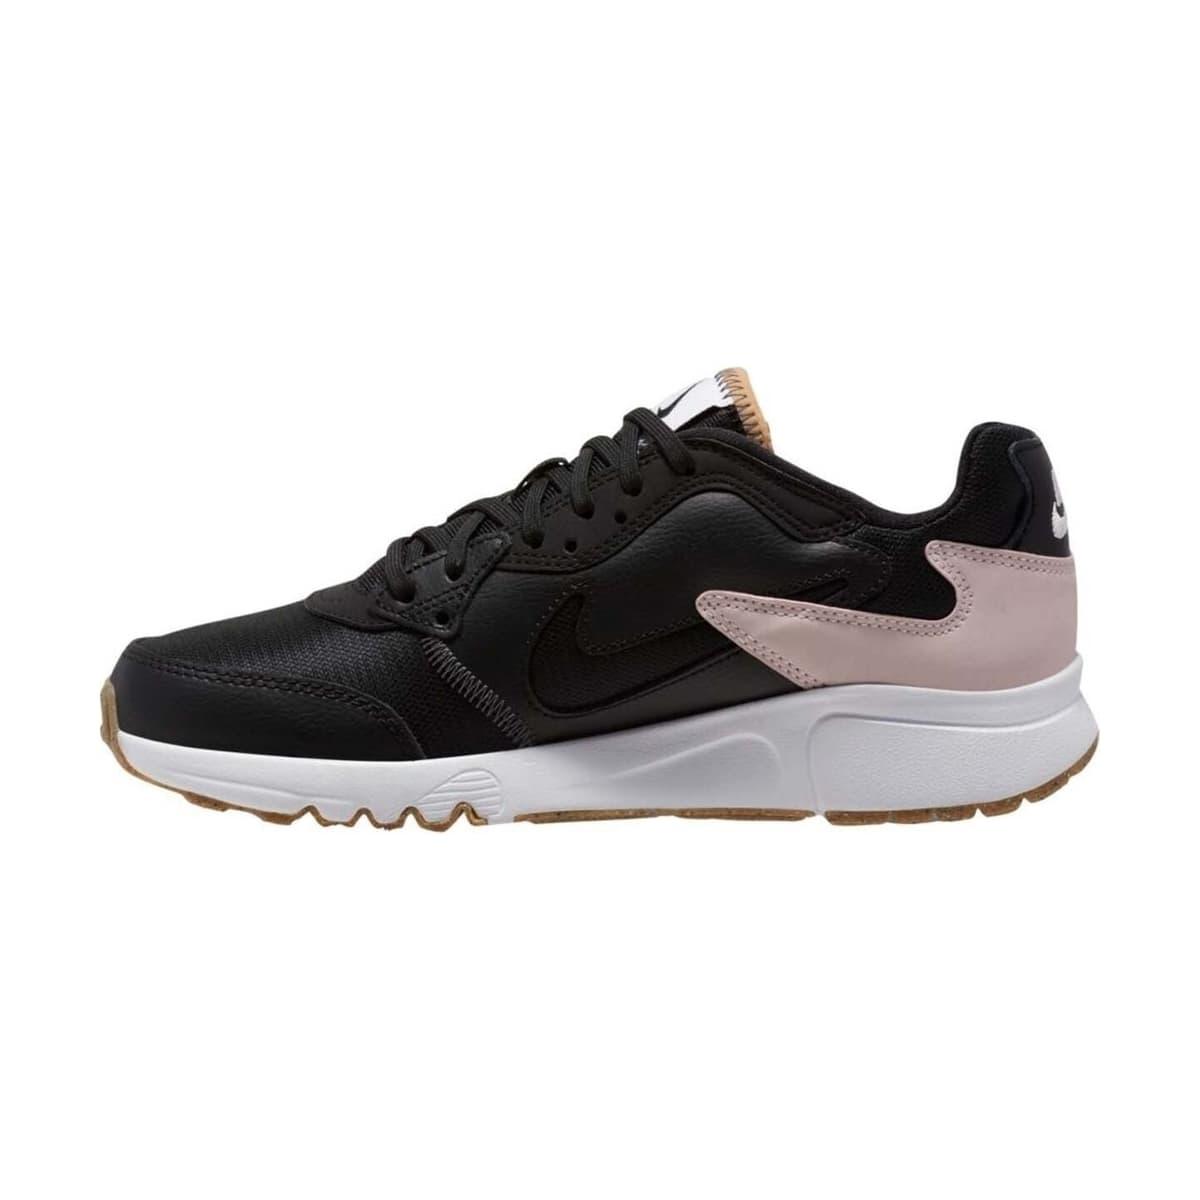 Atsuma Kadın Siyah Spor Ayakkabı (CN4493-002)